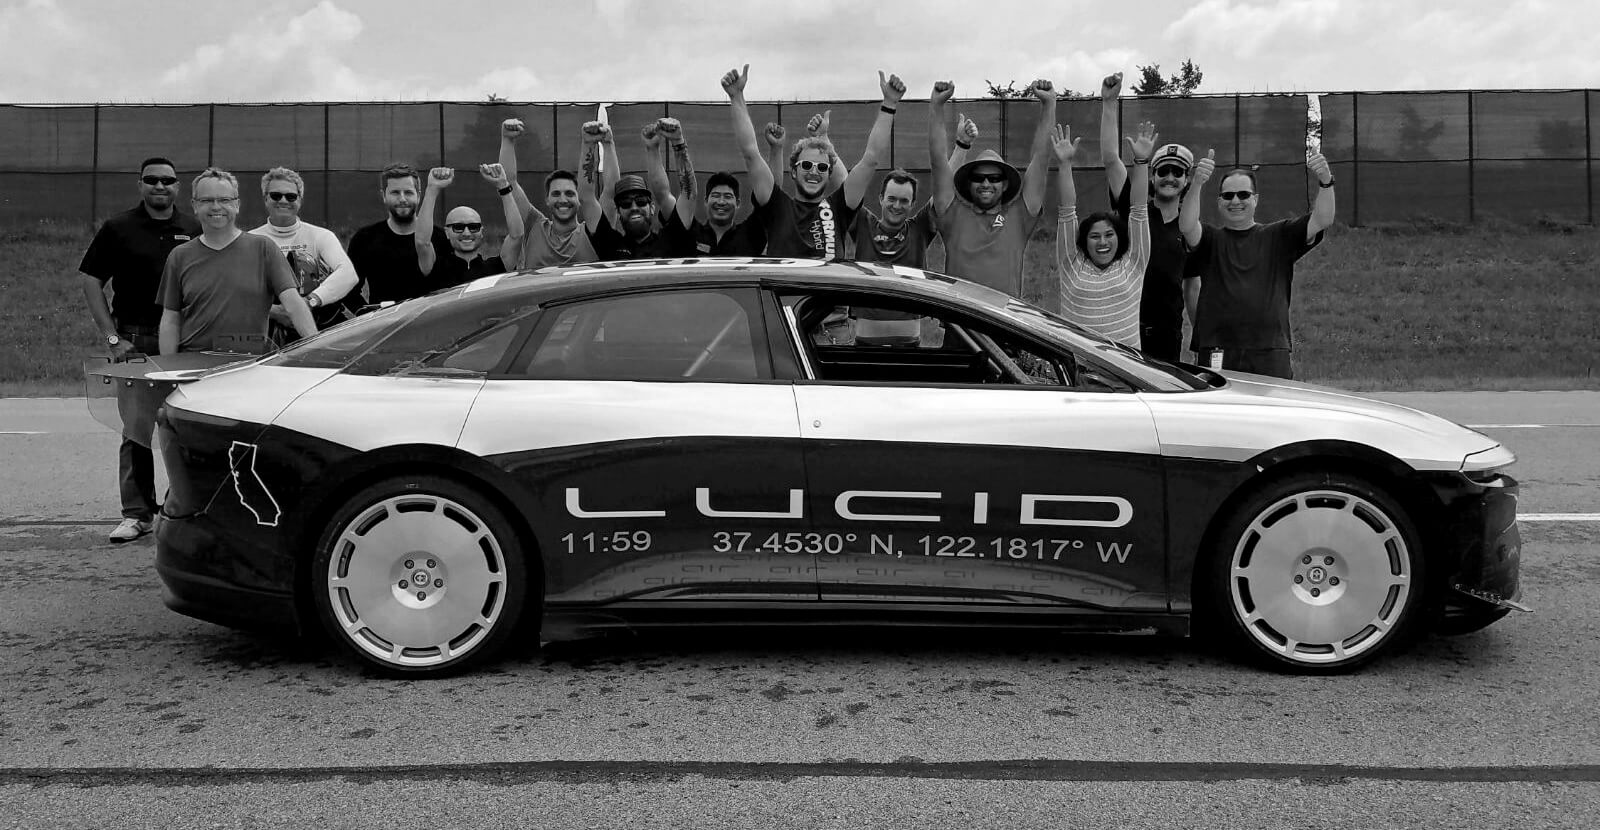 Команда Lucid Motors после 2 тест-драйва возле прототипа Lucid Air Alpha Speed Car